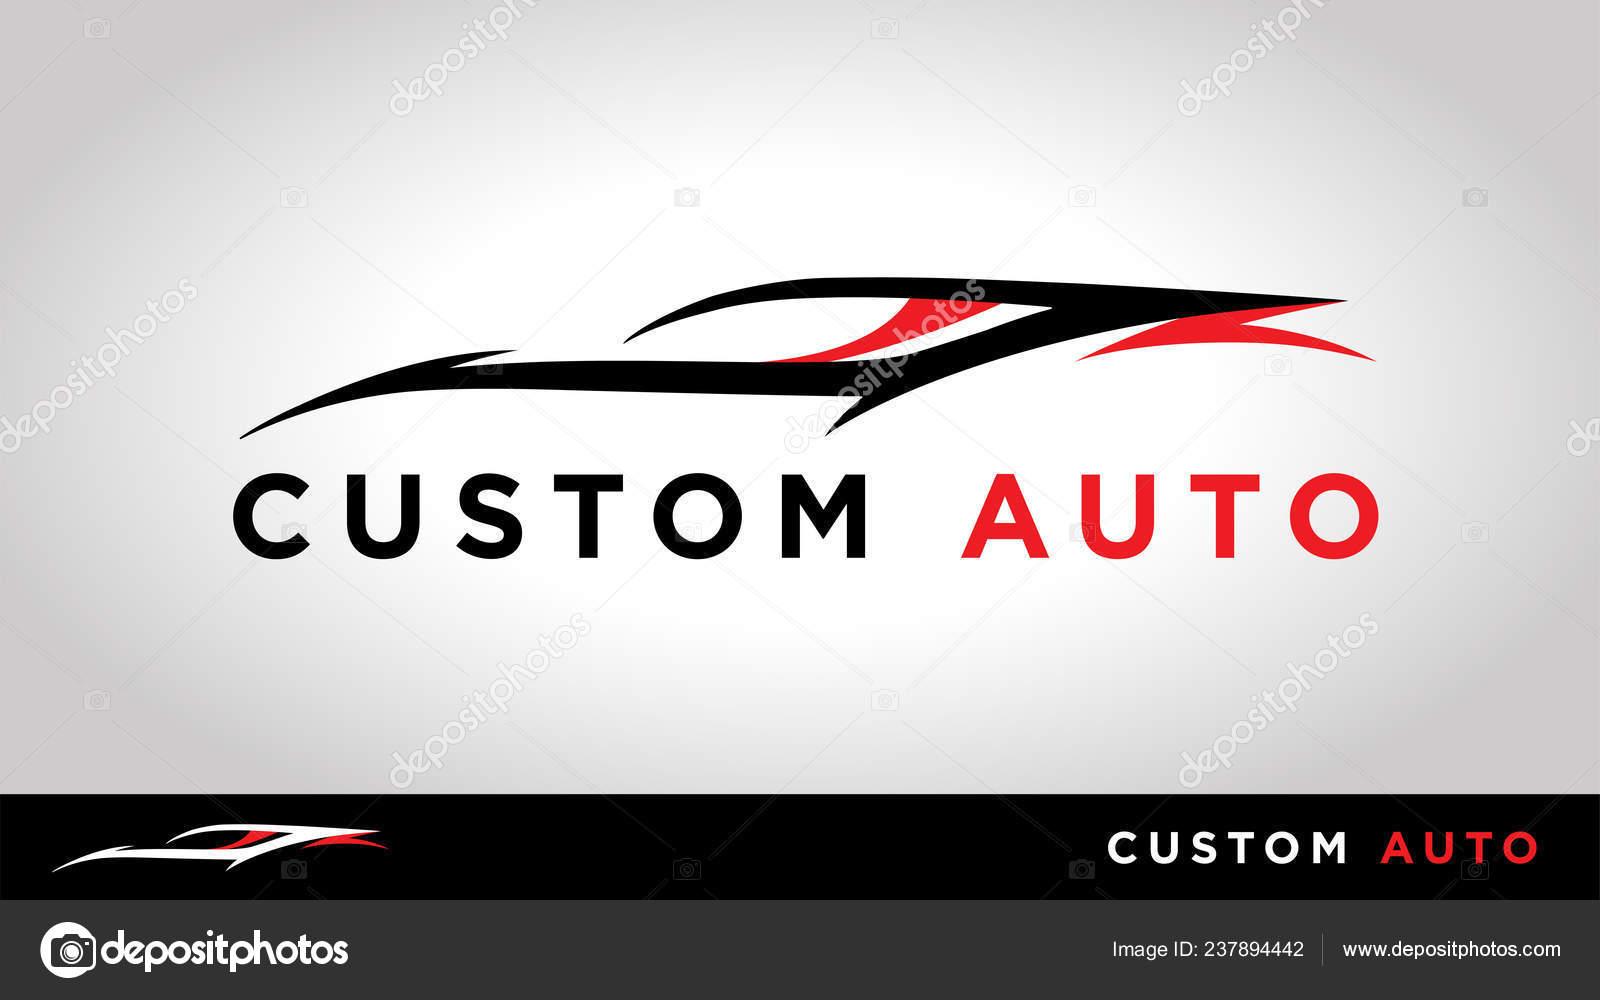 Custom Auto Sportscar Silhouette Vehicle Tuning Shop Logo Design